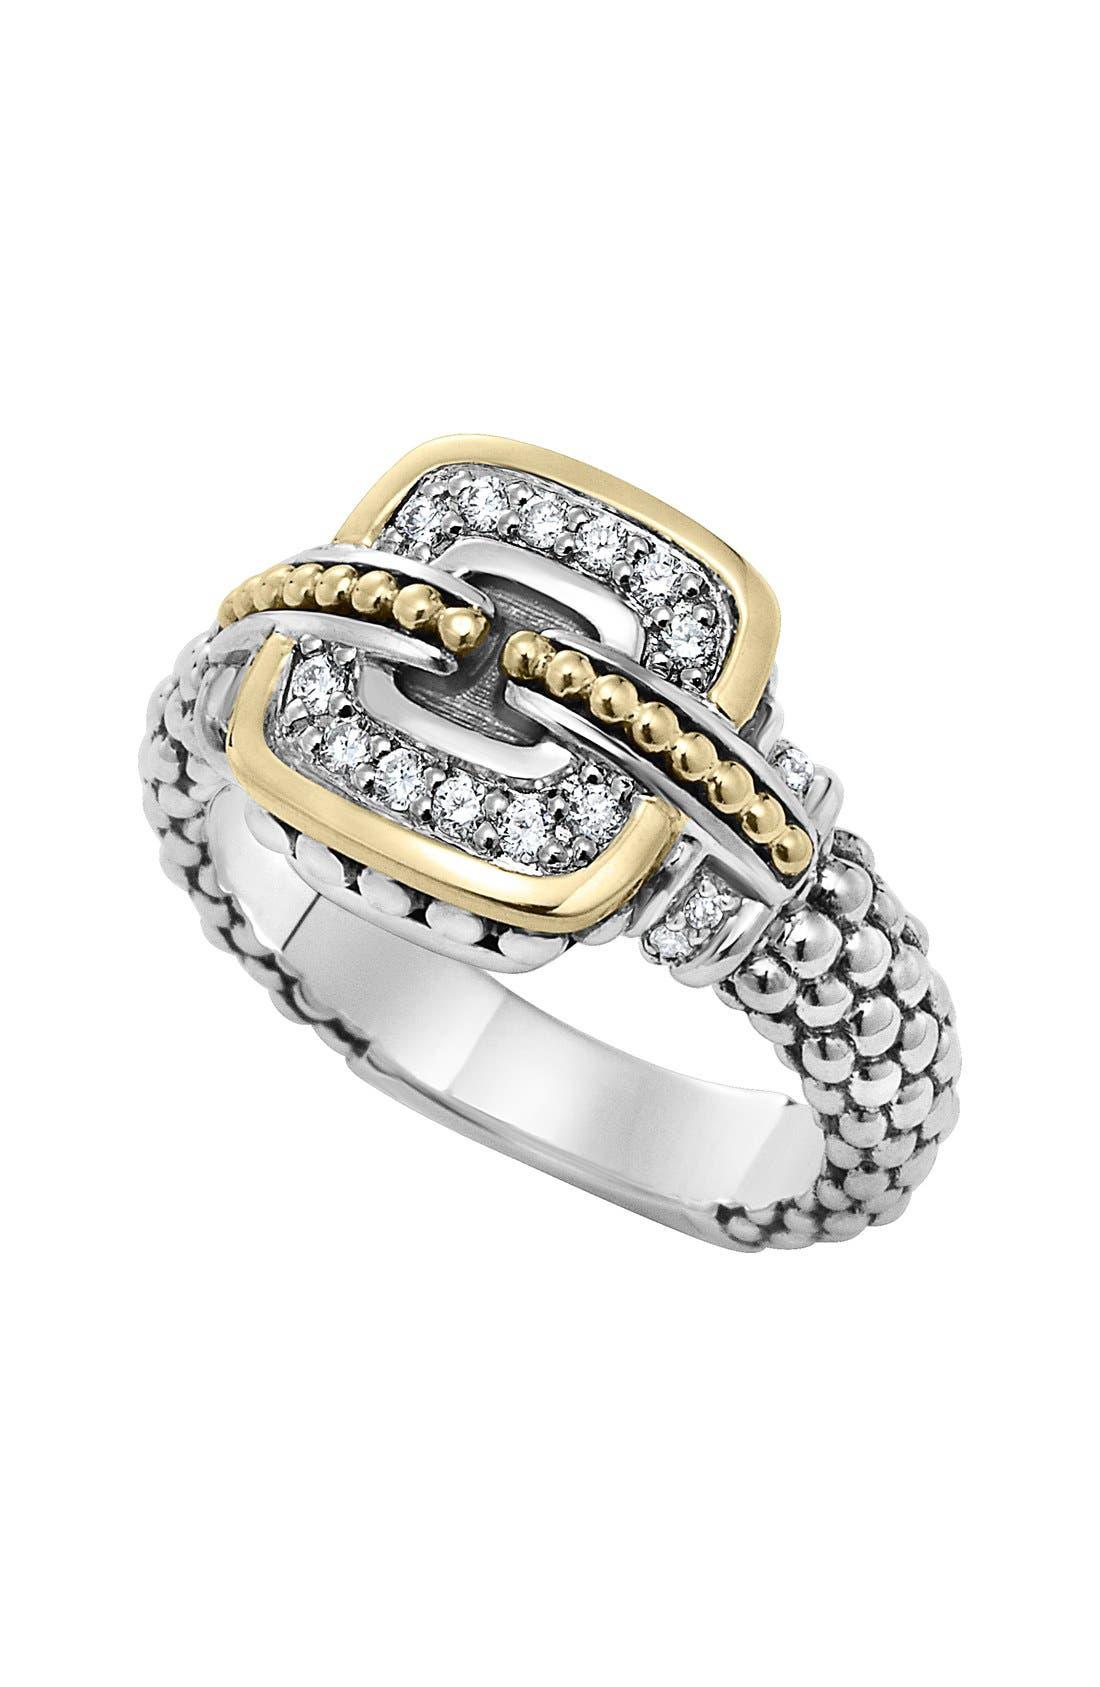 Main Image - LAGOS 'Cushion' Small Diamond Ring